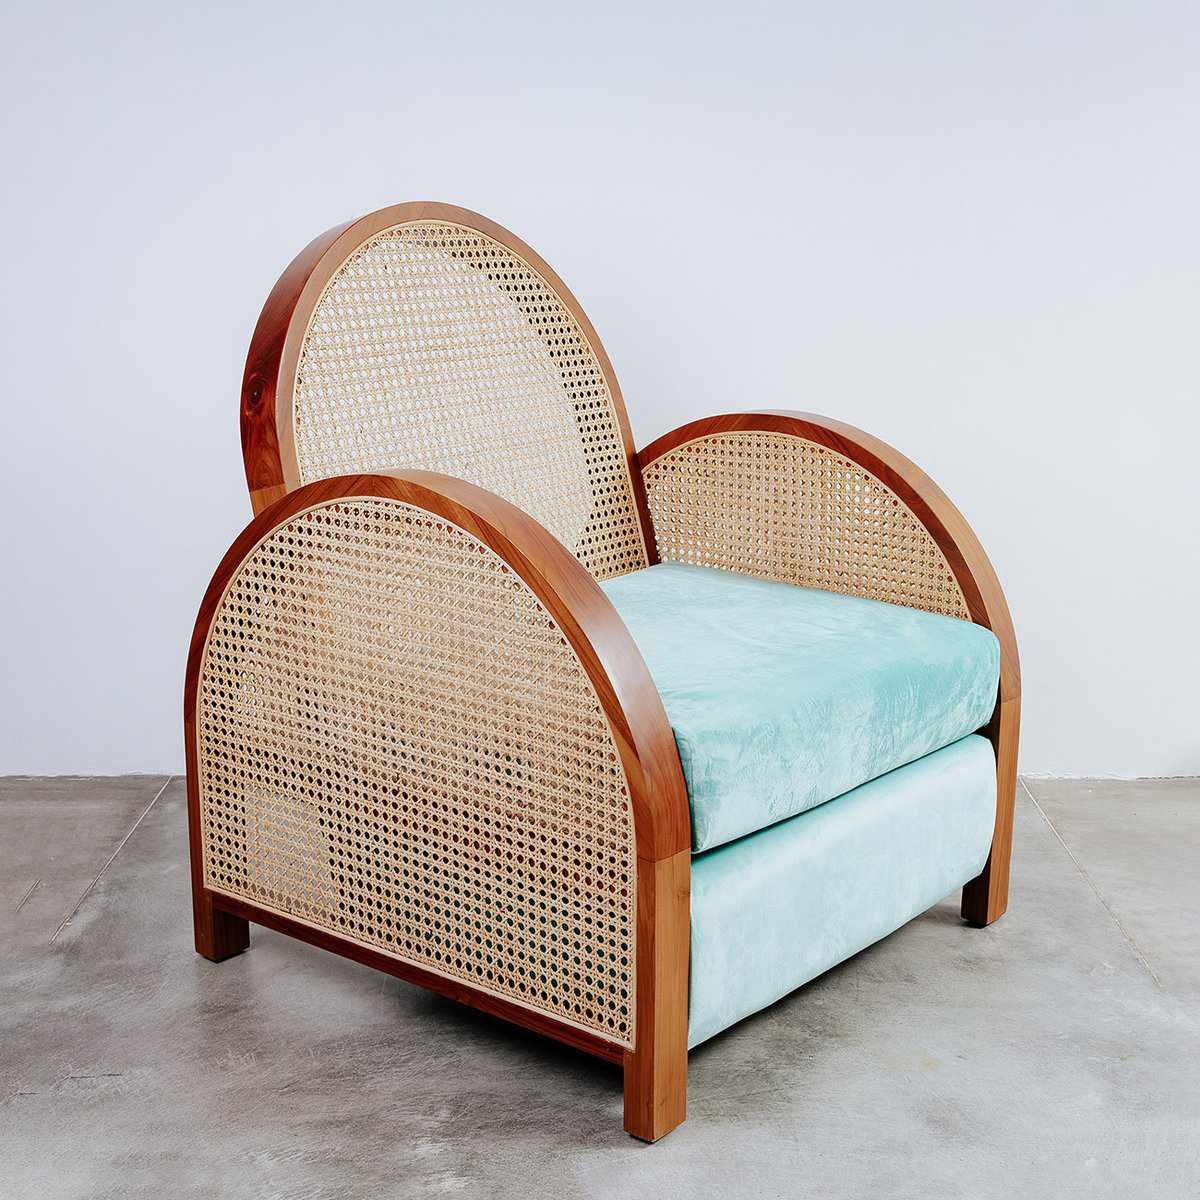 France & Son Arc Cane Lounge Chair